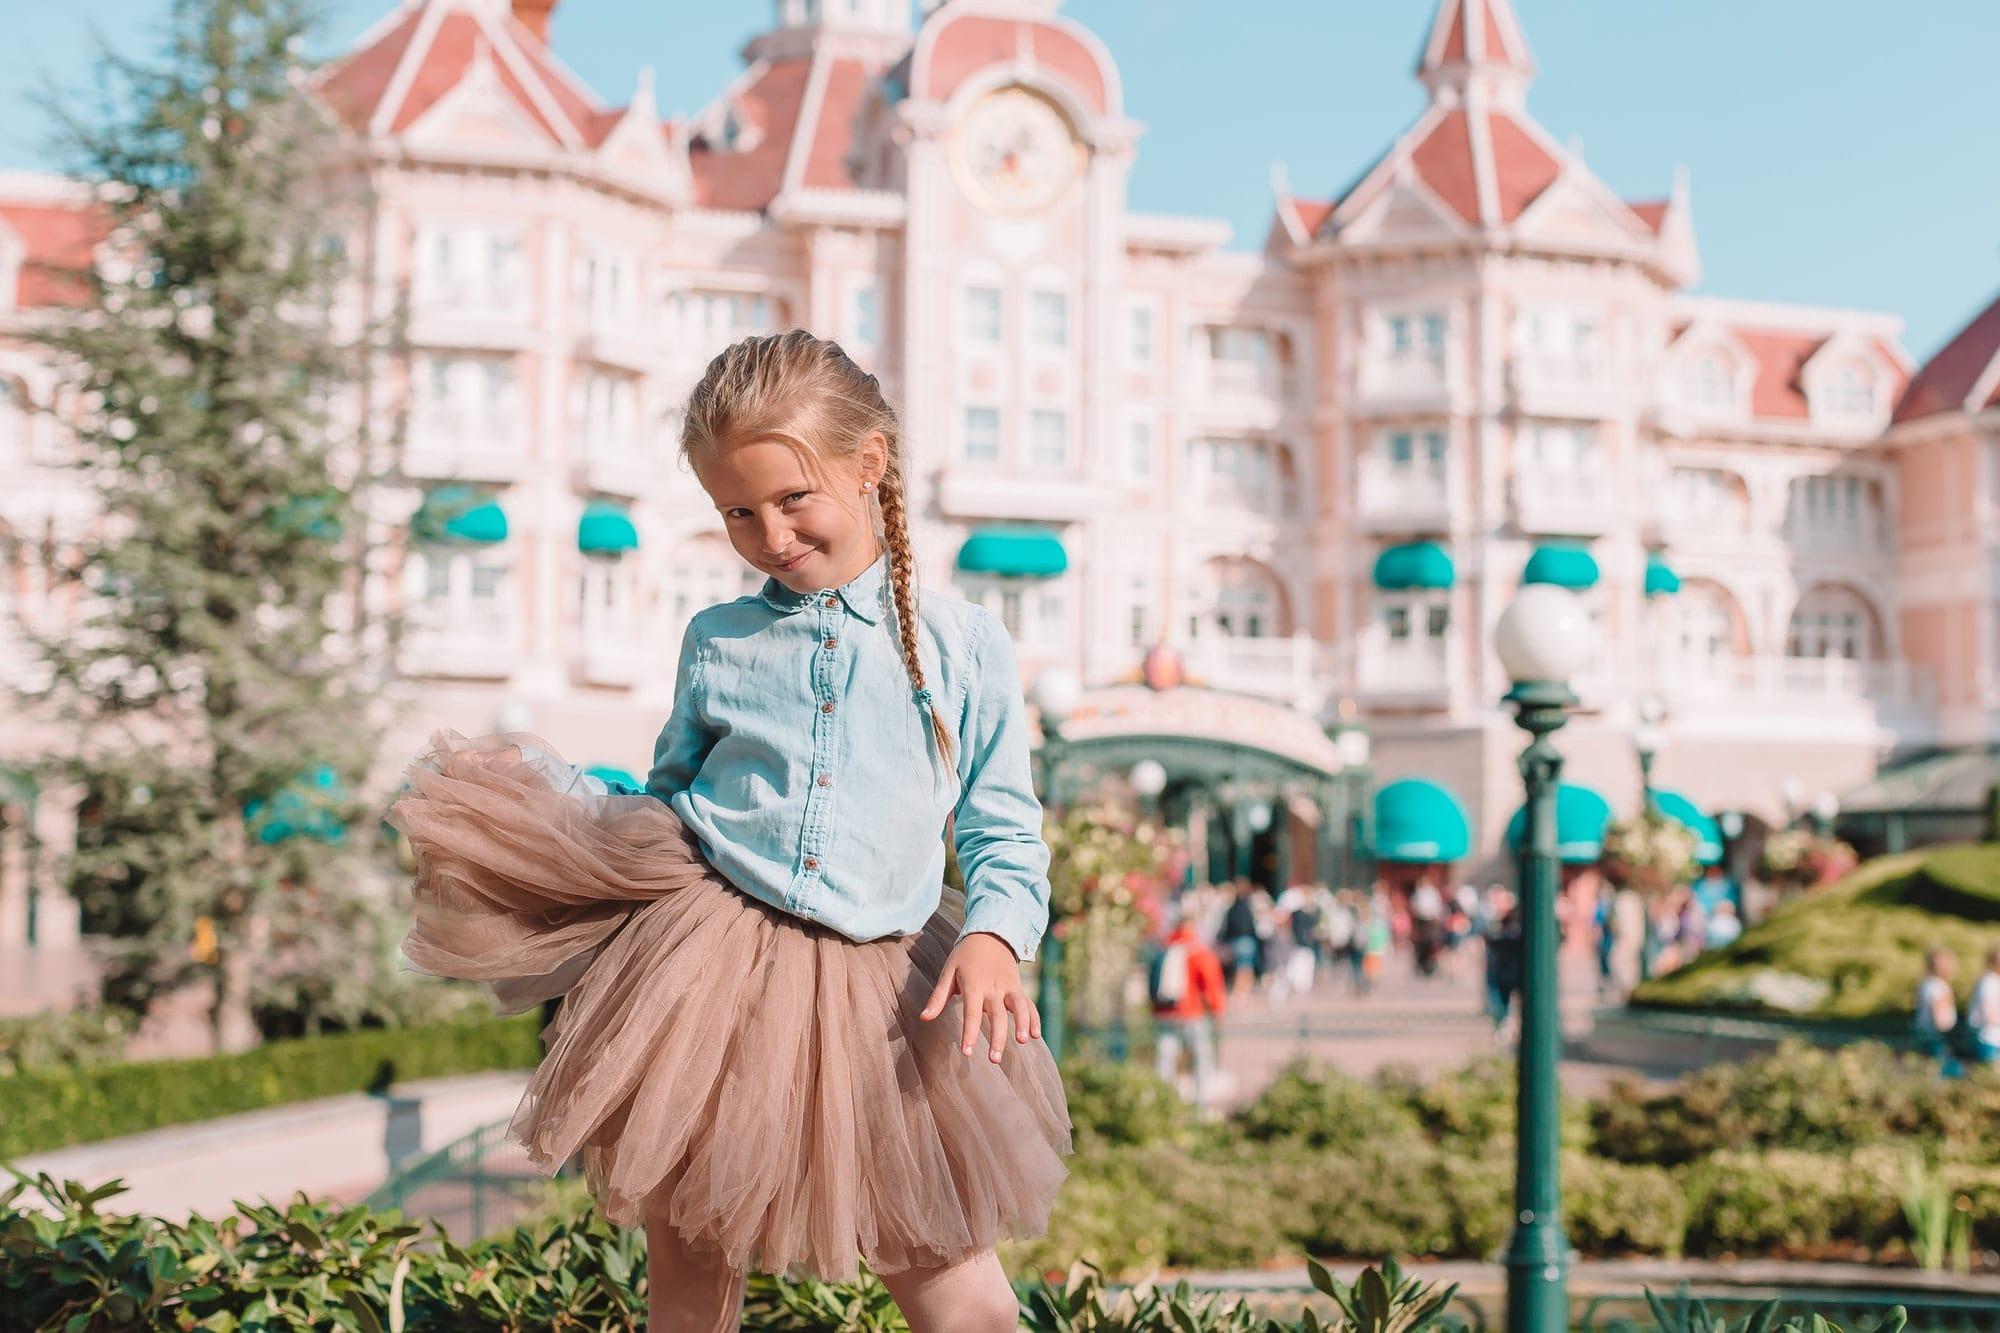 Little adorable girl in Cinderella dress at fairy-tale Disneyland park